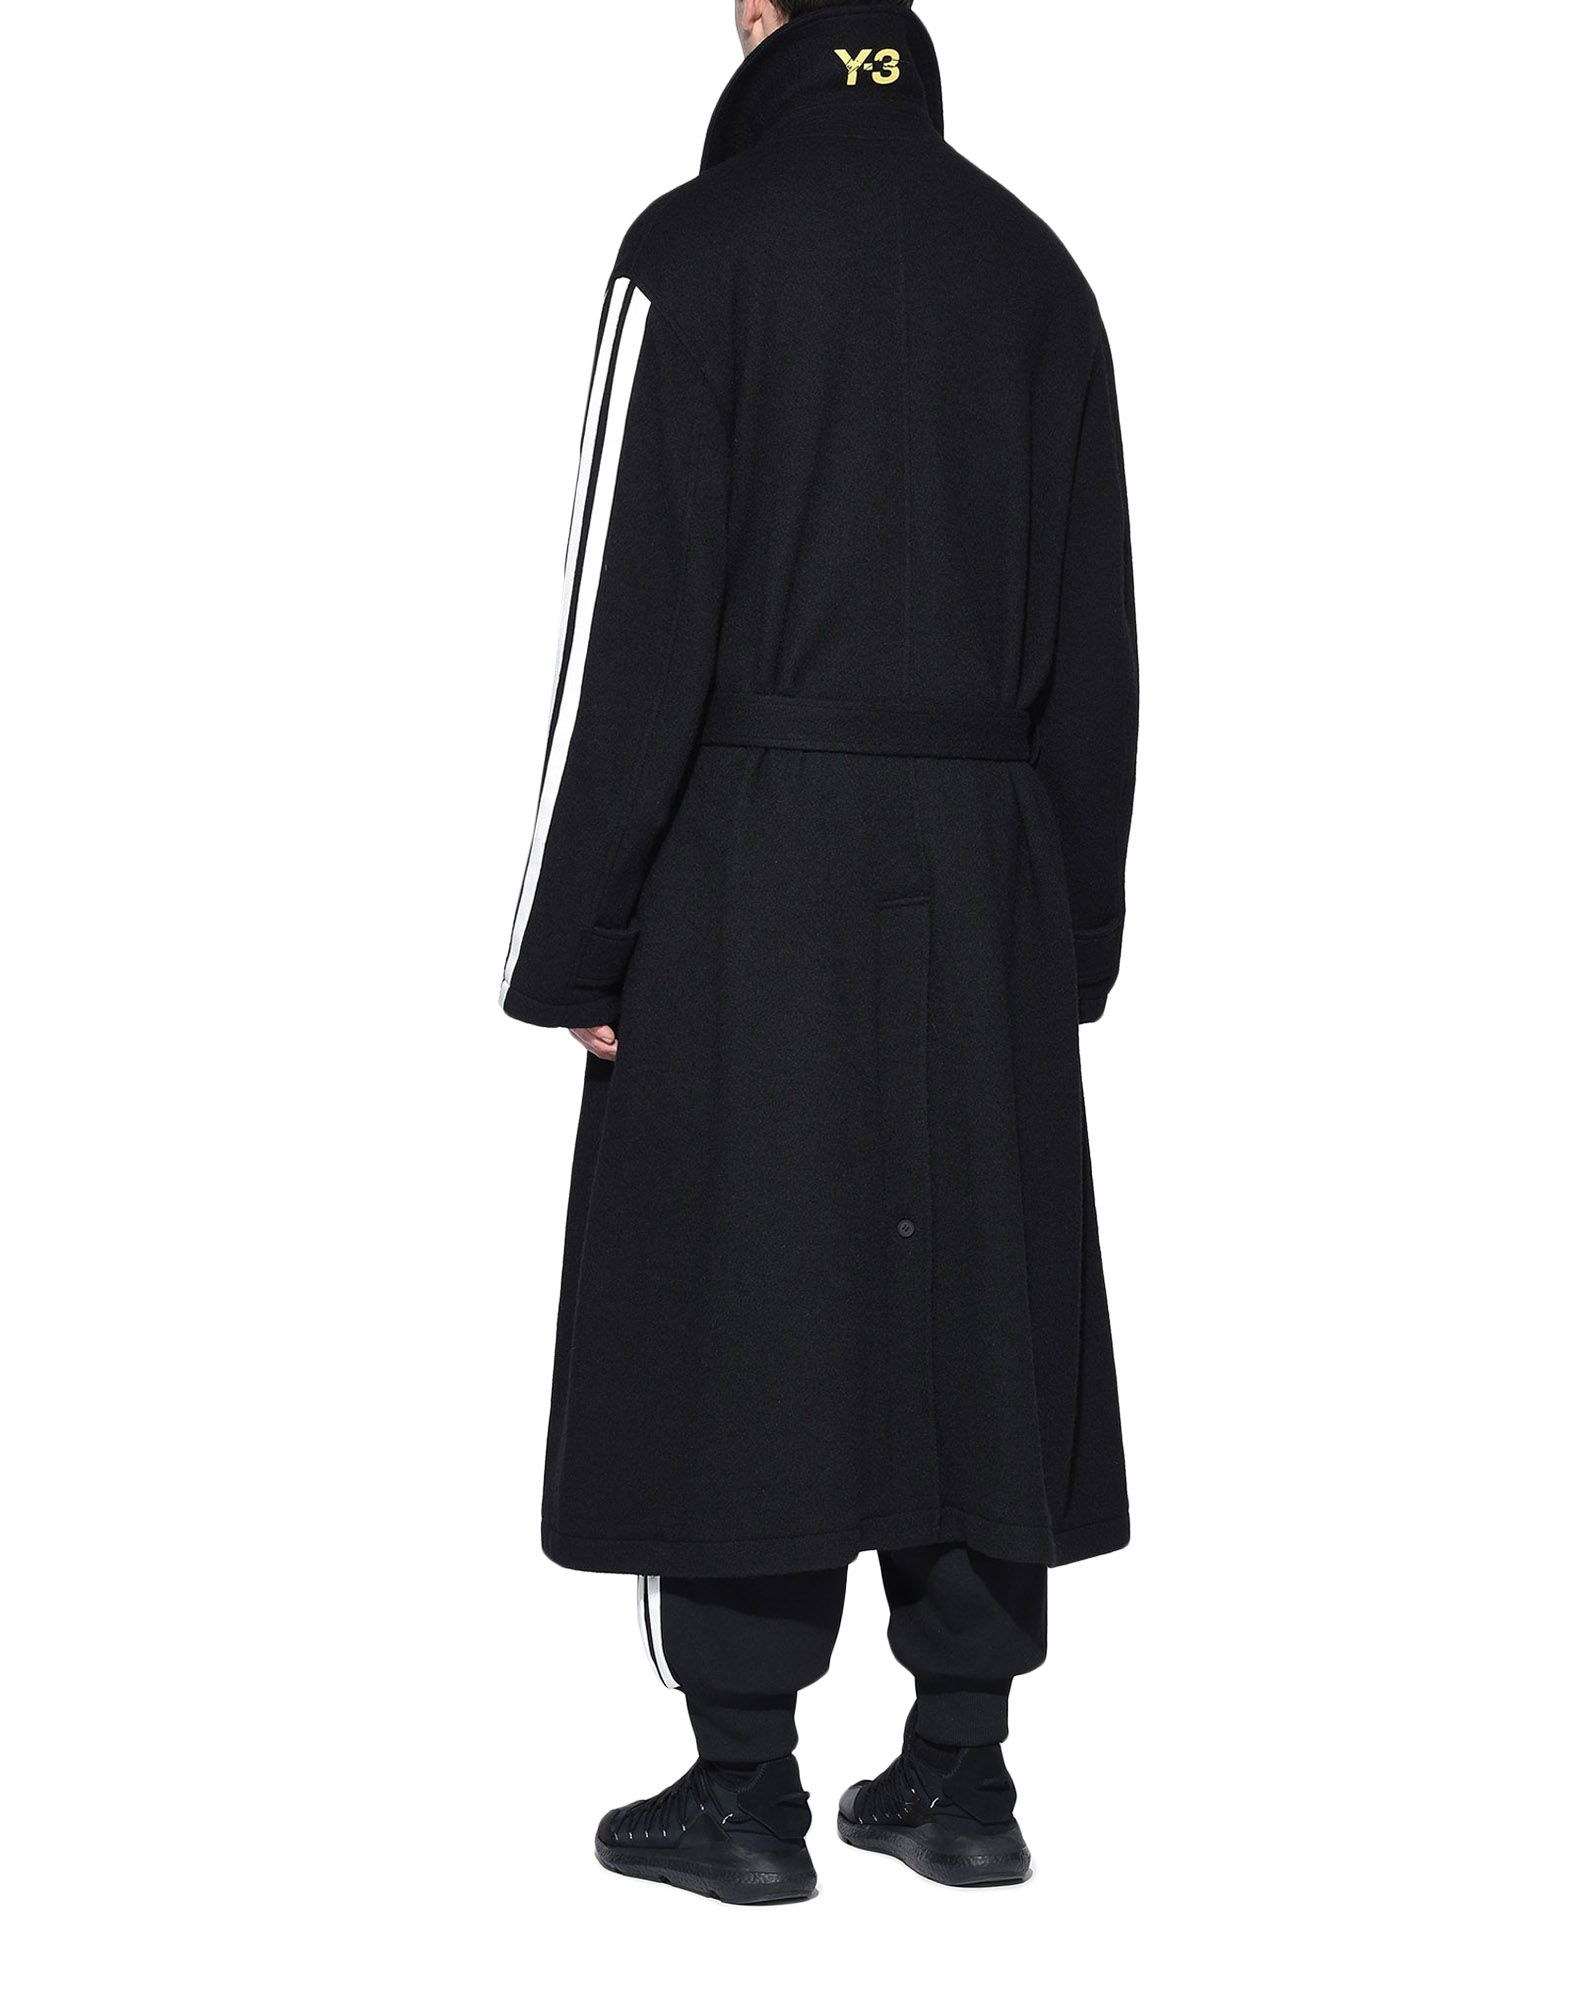 Y-3 Y-3 Tailored Wool Coat コート メンズ e